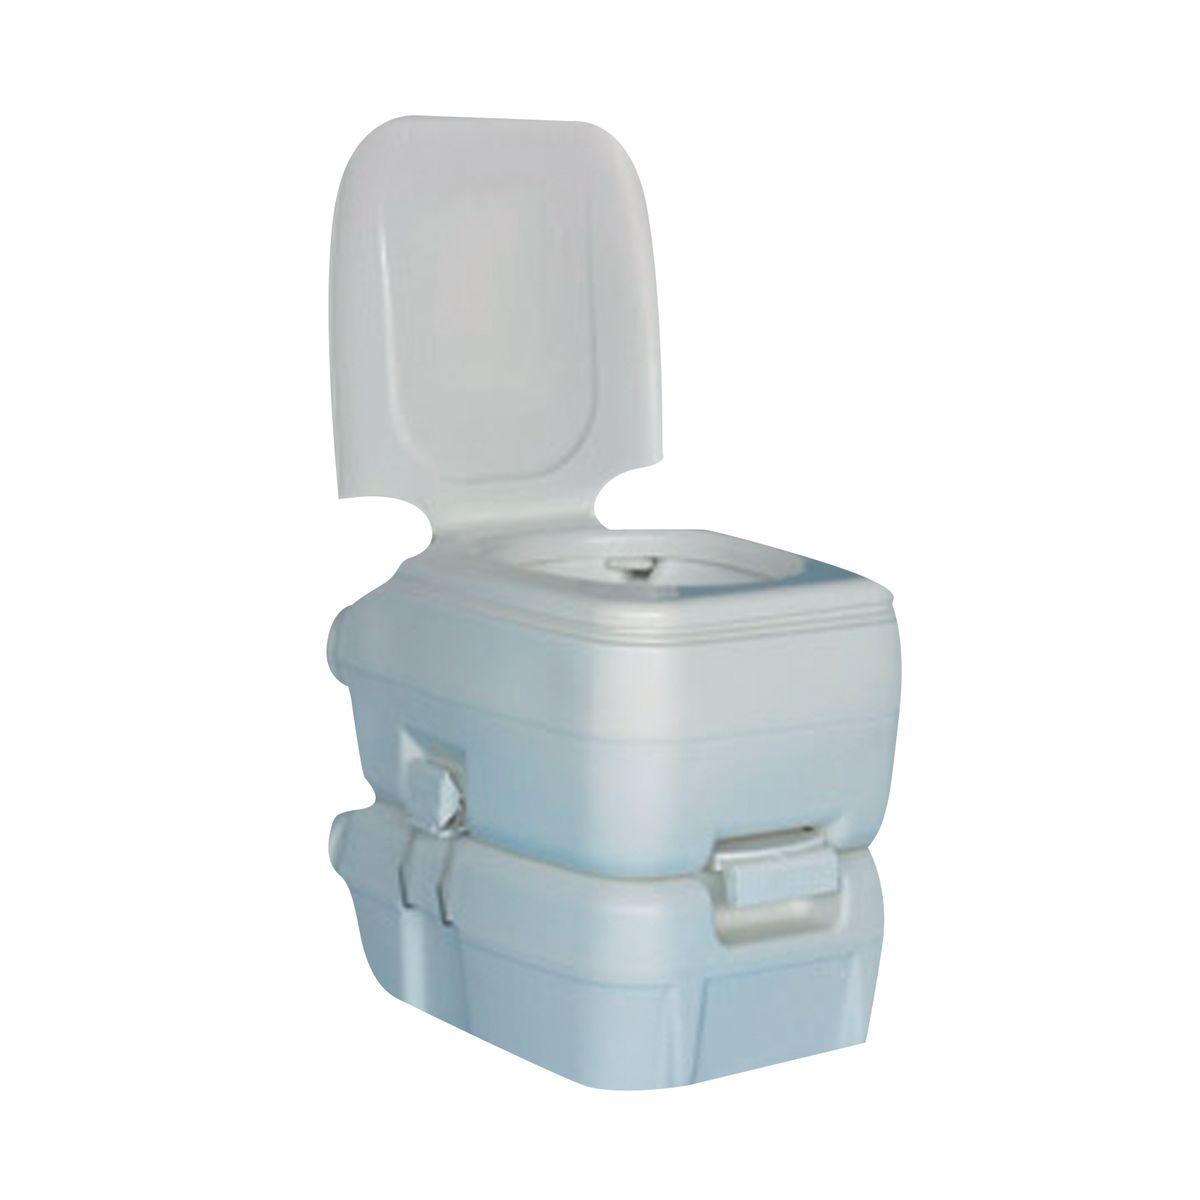 Polvere di ceramica leroy merlin affordable palladiana x for Polvere di ceramica leroy merlin